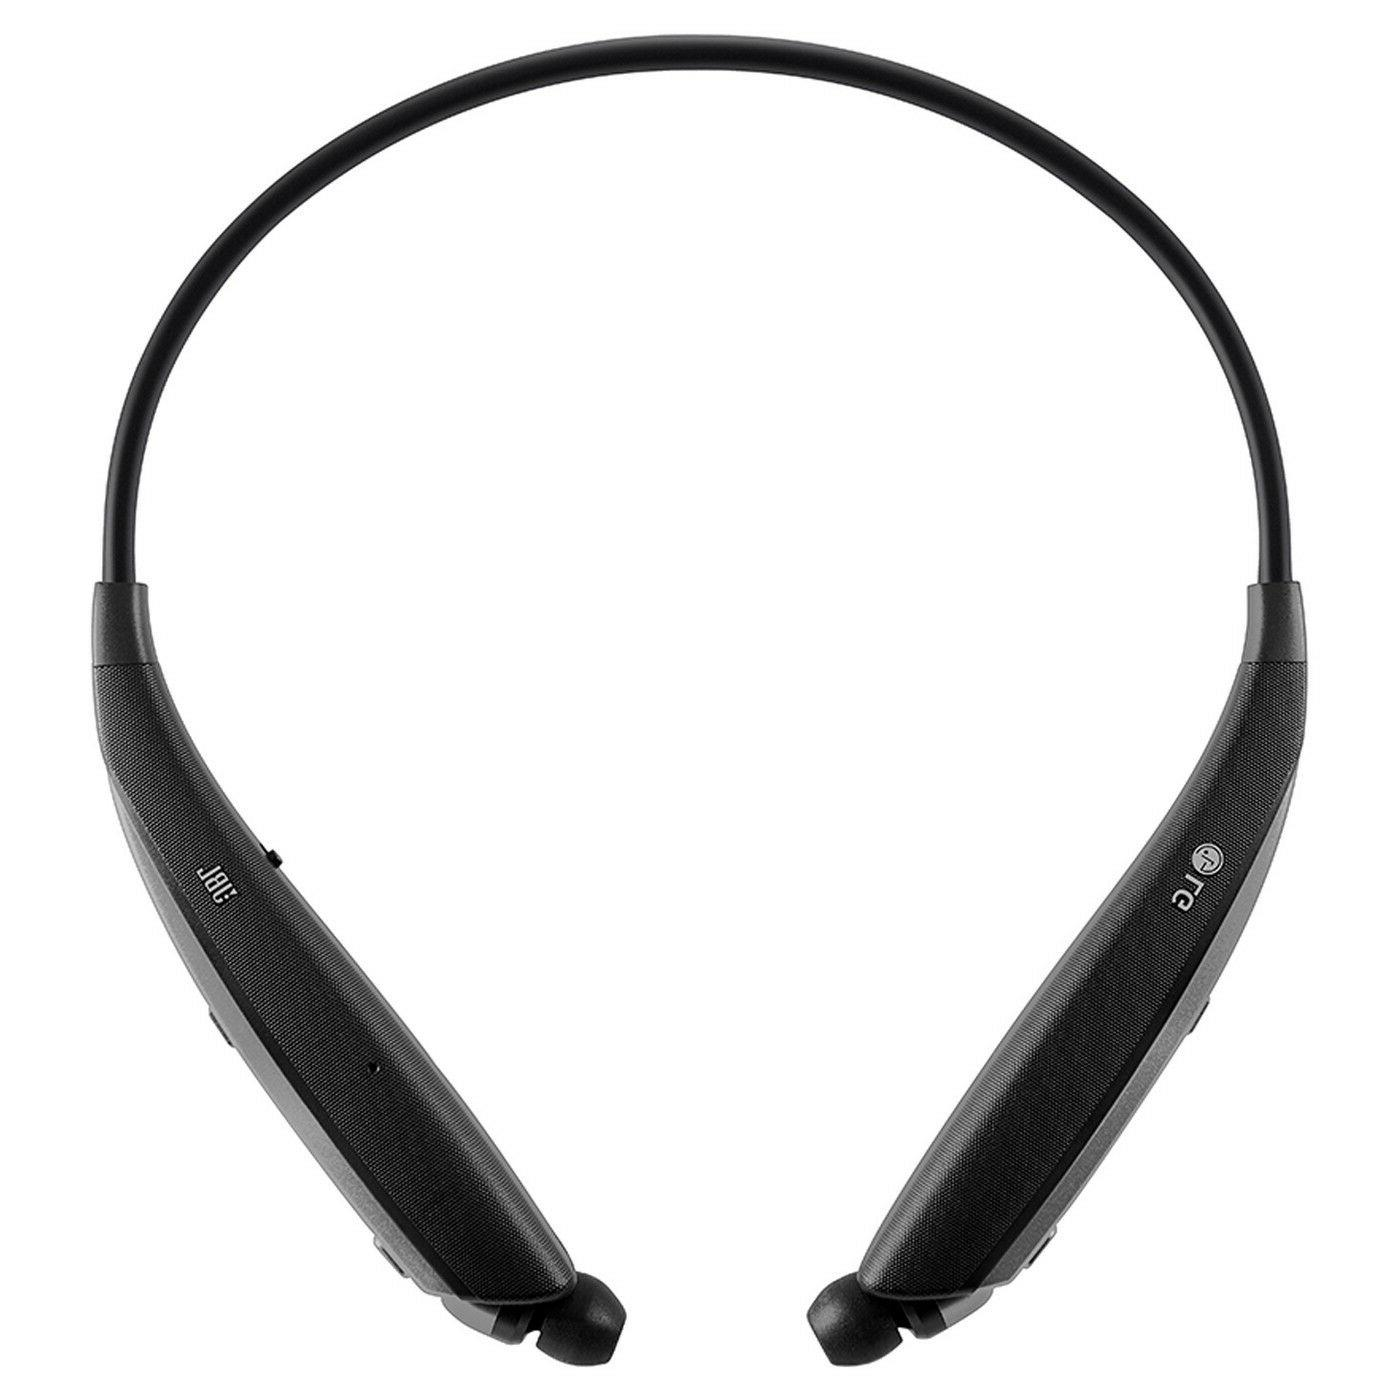 LG Bluetooth Stereo -